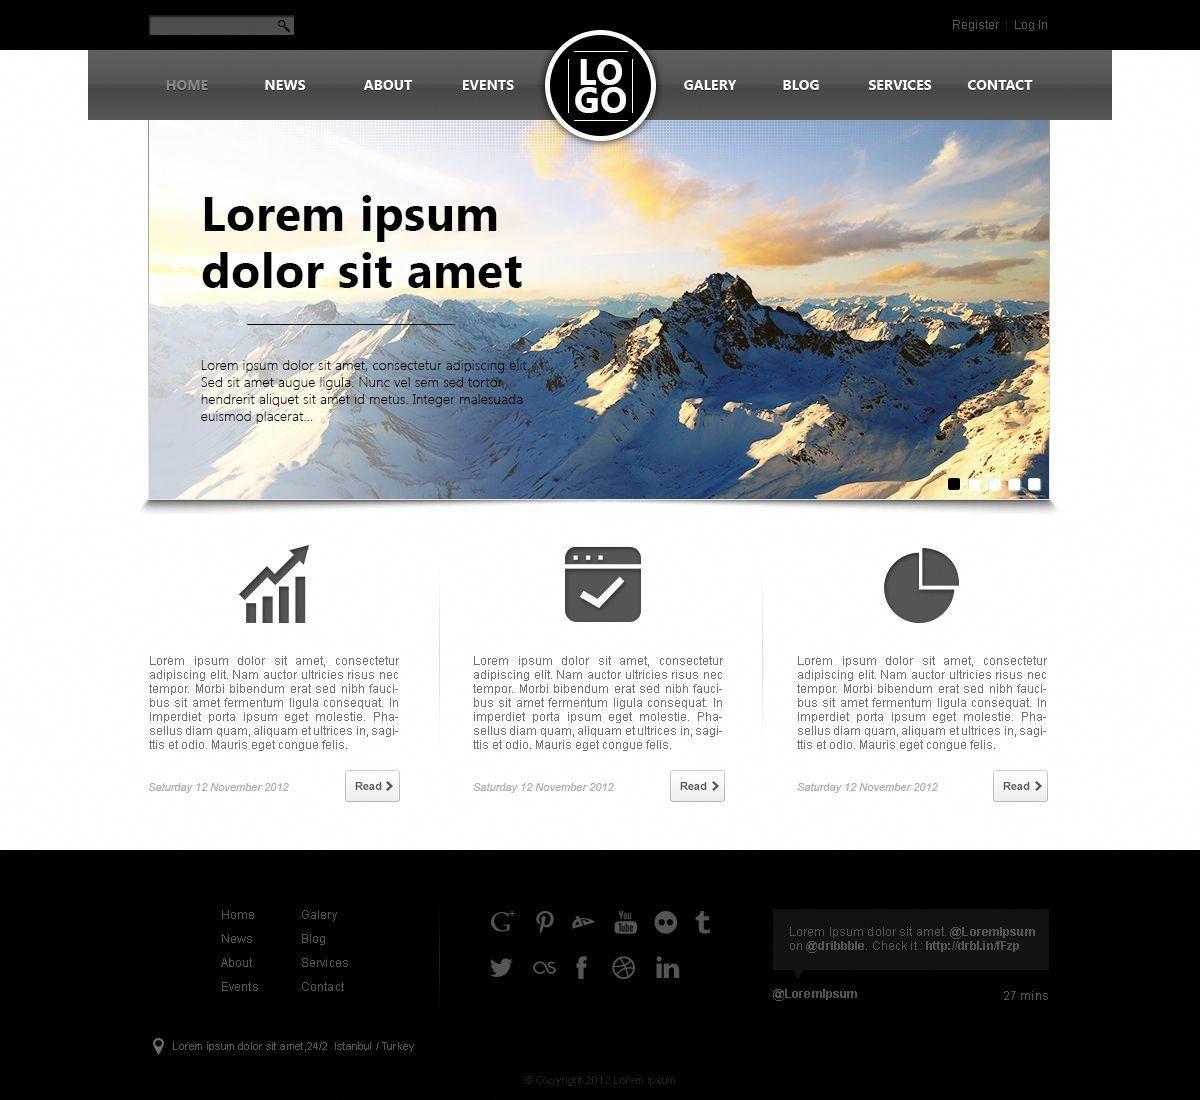 Template1 30 Free Psd Web Design Templates Psd Web Design Website Template Design Ecommerce Website Design